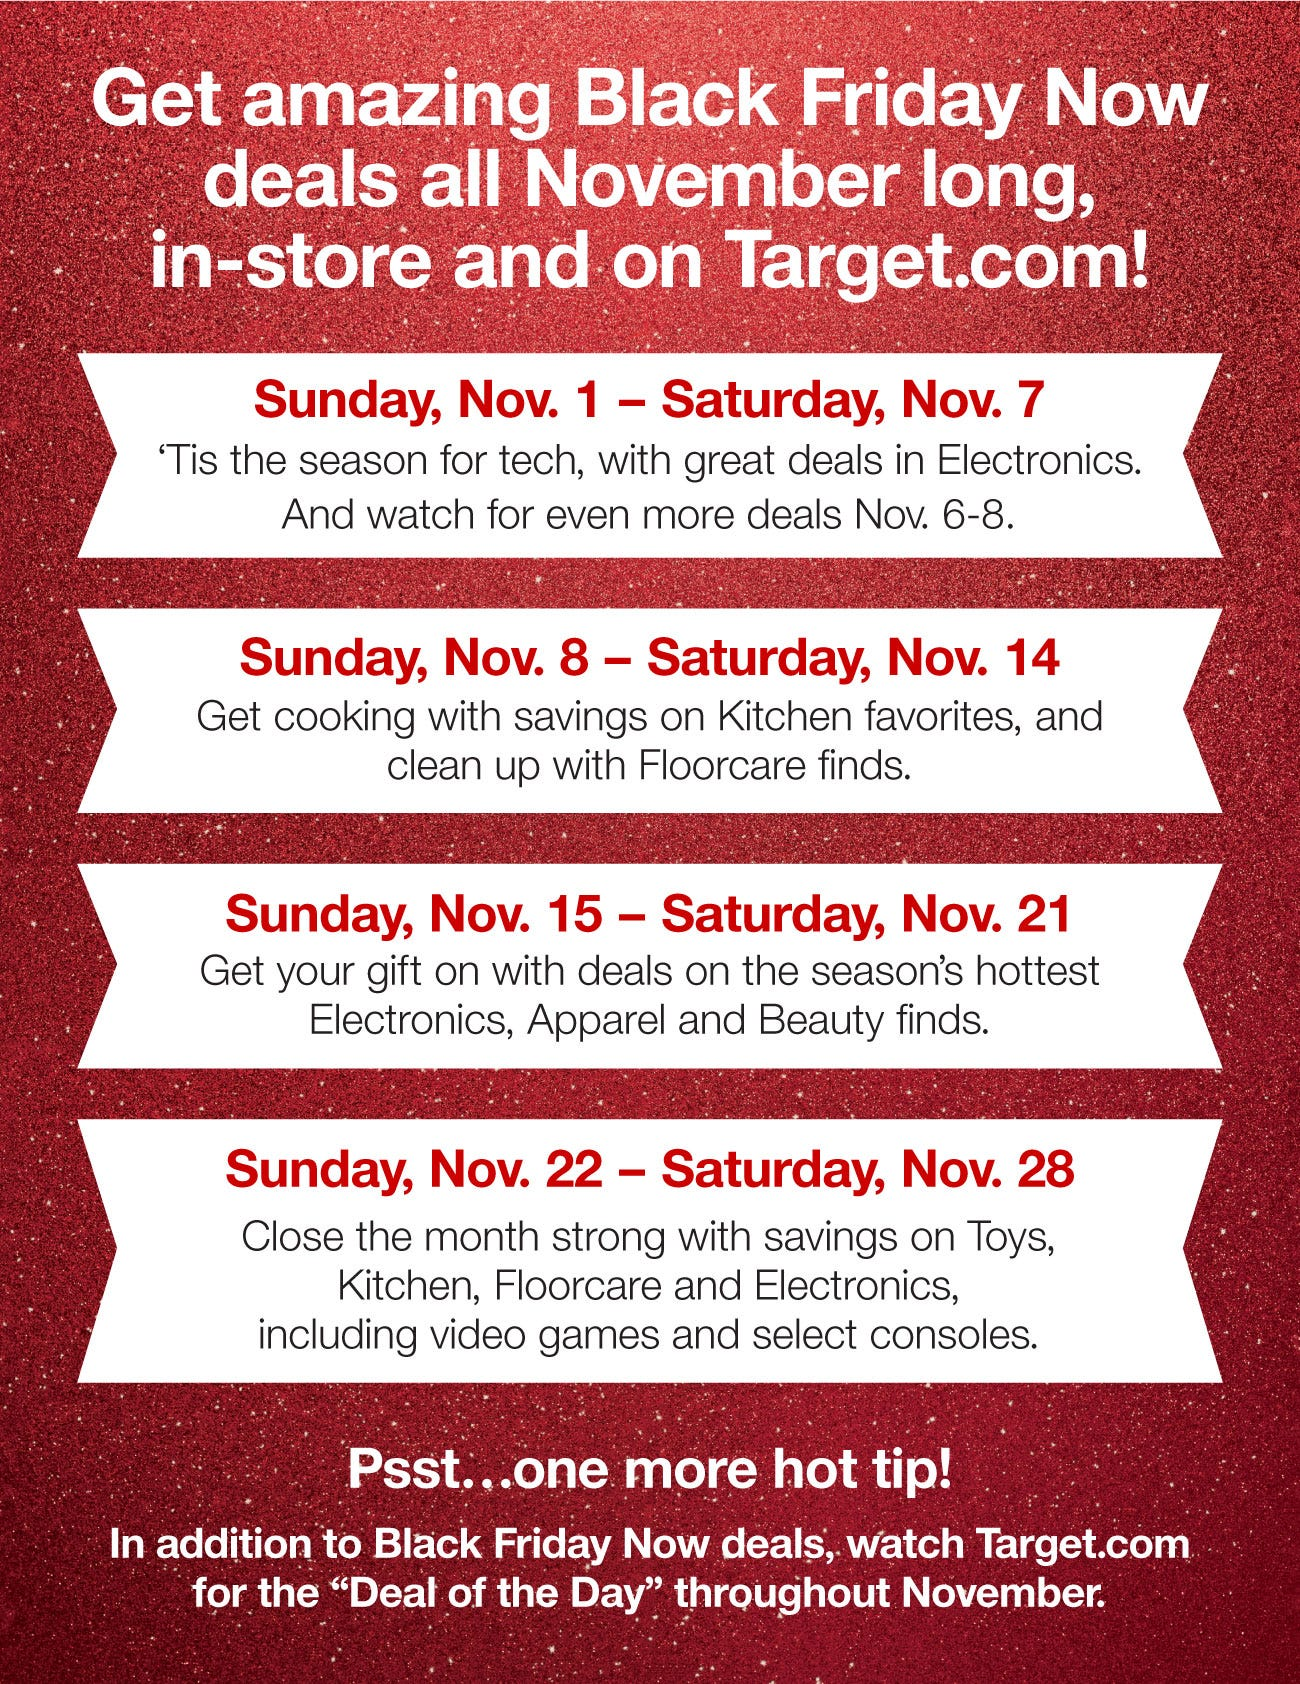 Target's November Black Friday deals outlined by week.